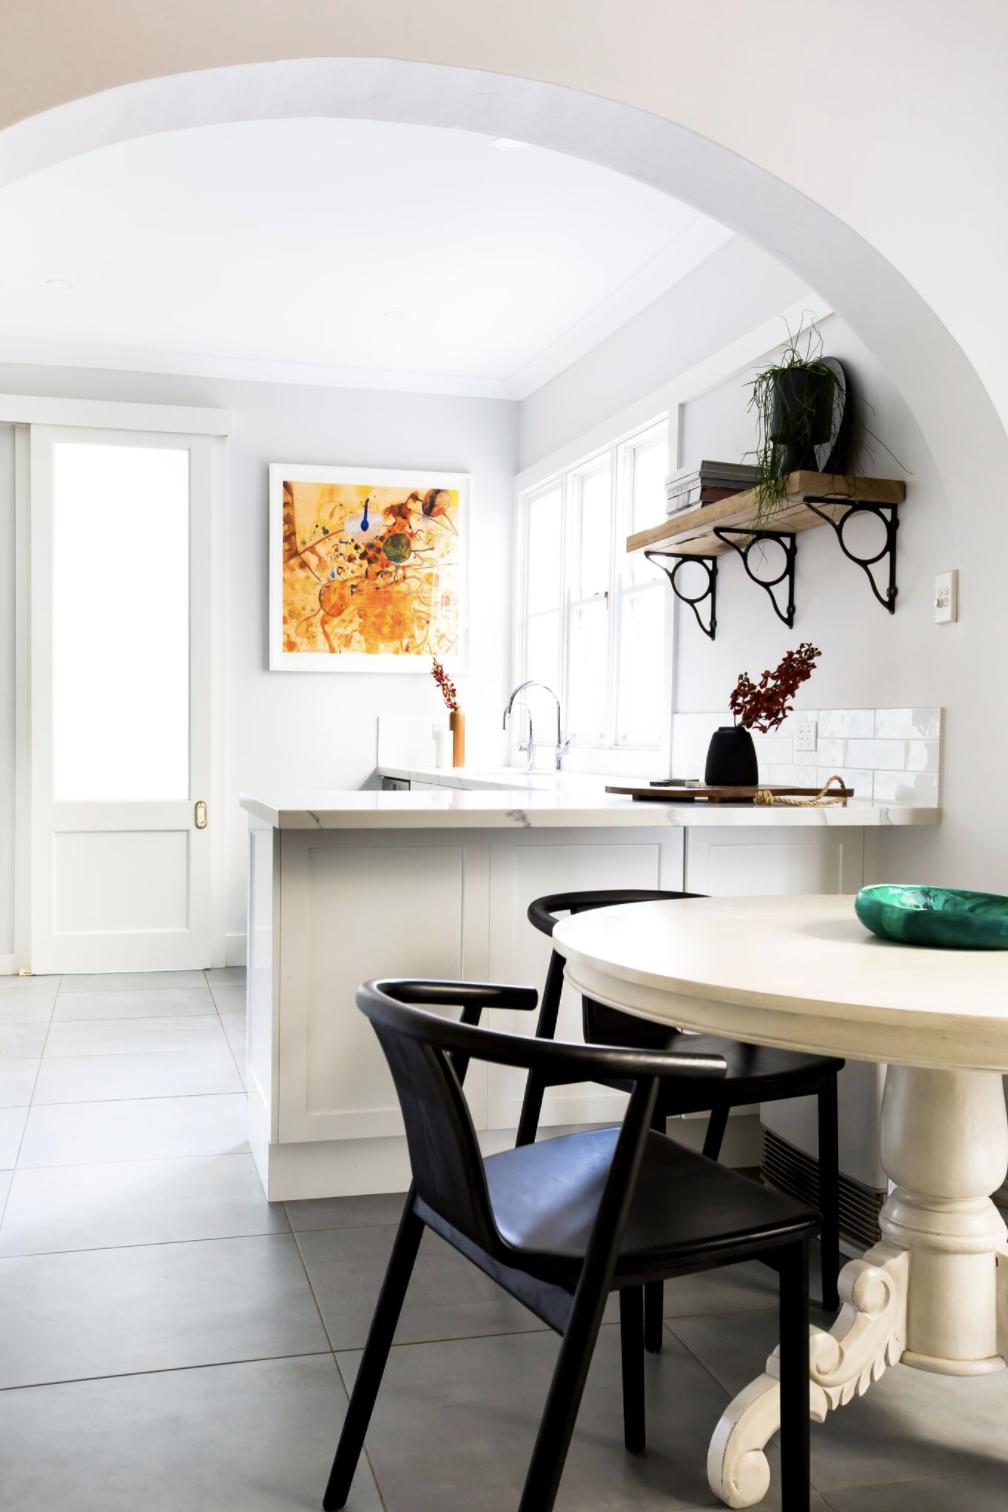 Ormond Terrace. Photographer Heather Fletcher, Interiors by Kate Leabeater